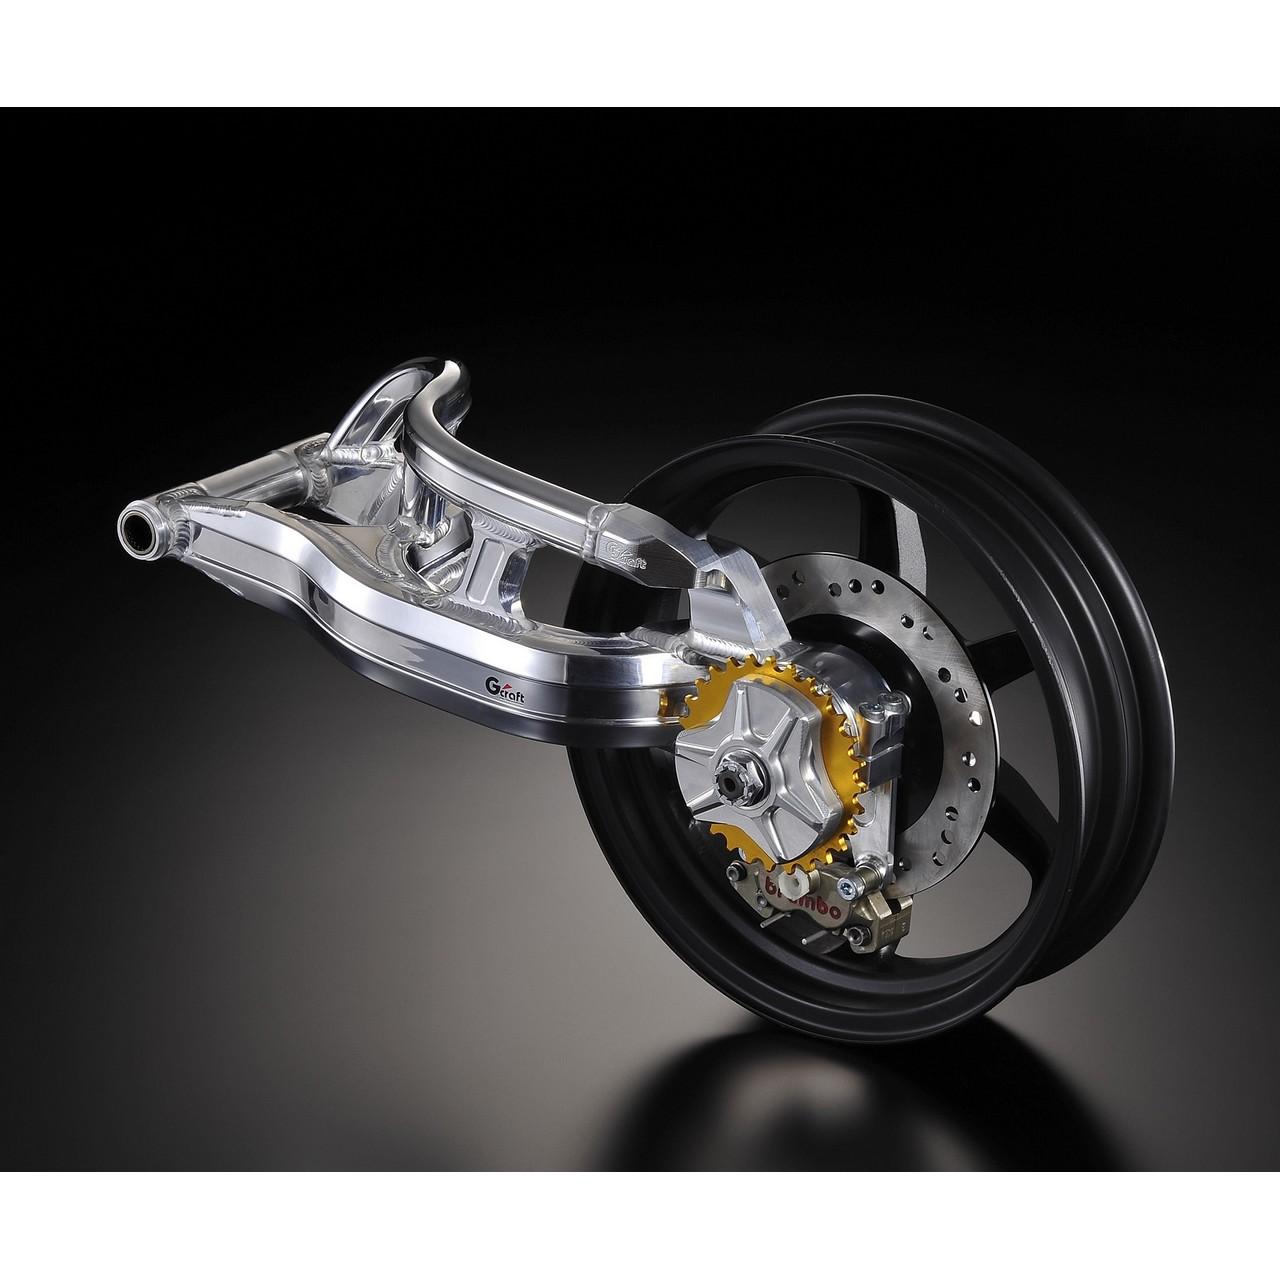 【G-Craft】XR50/100用單邊型後搖臂 - 「Webike-摩托百貨」